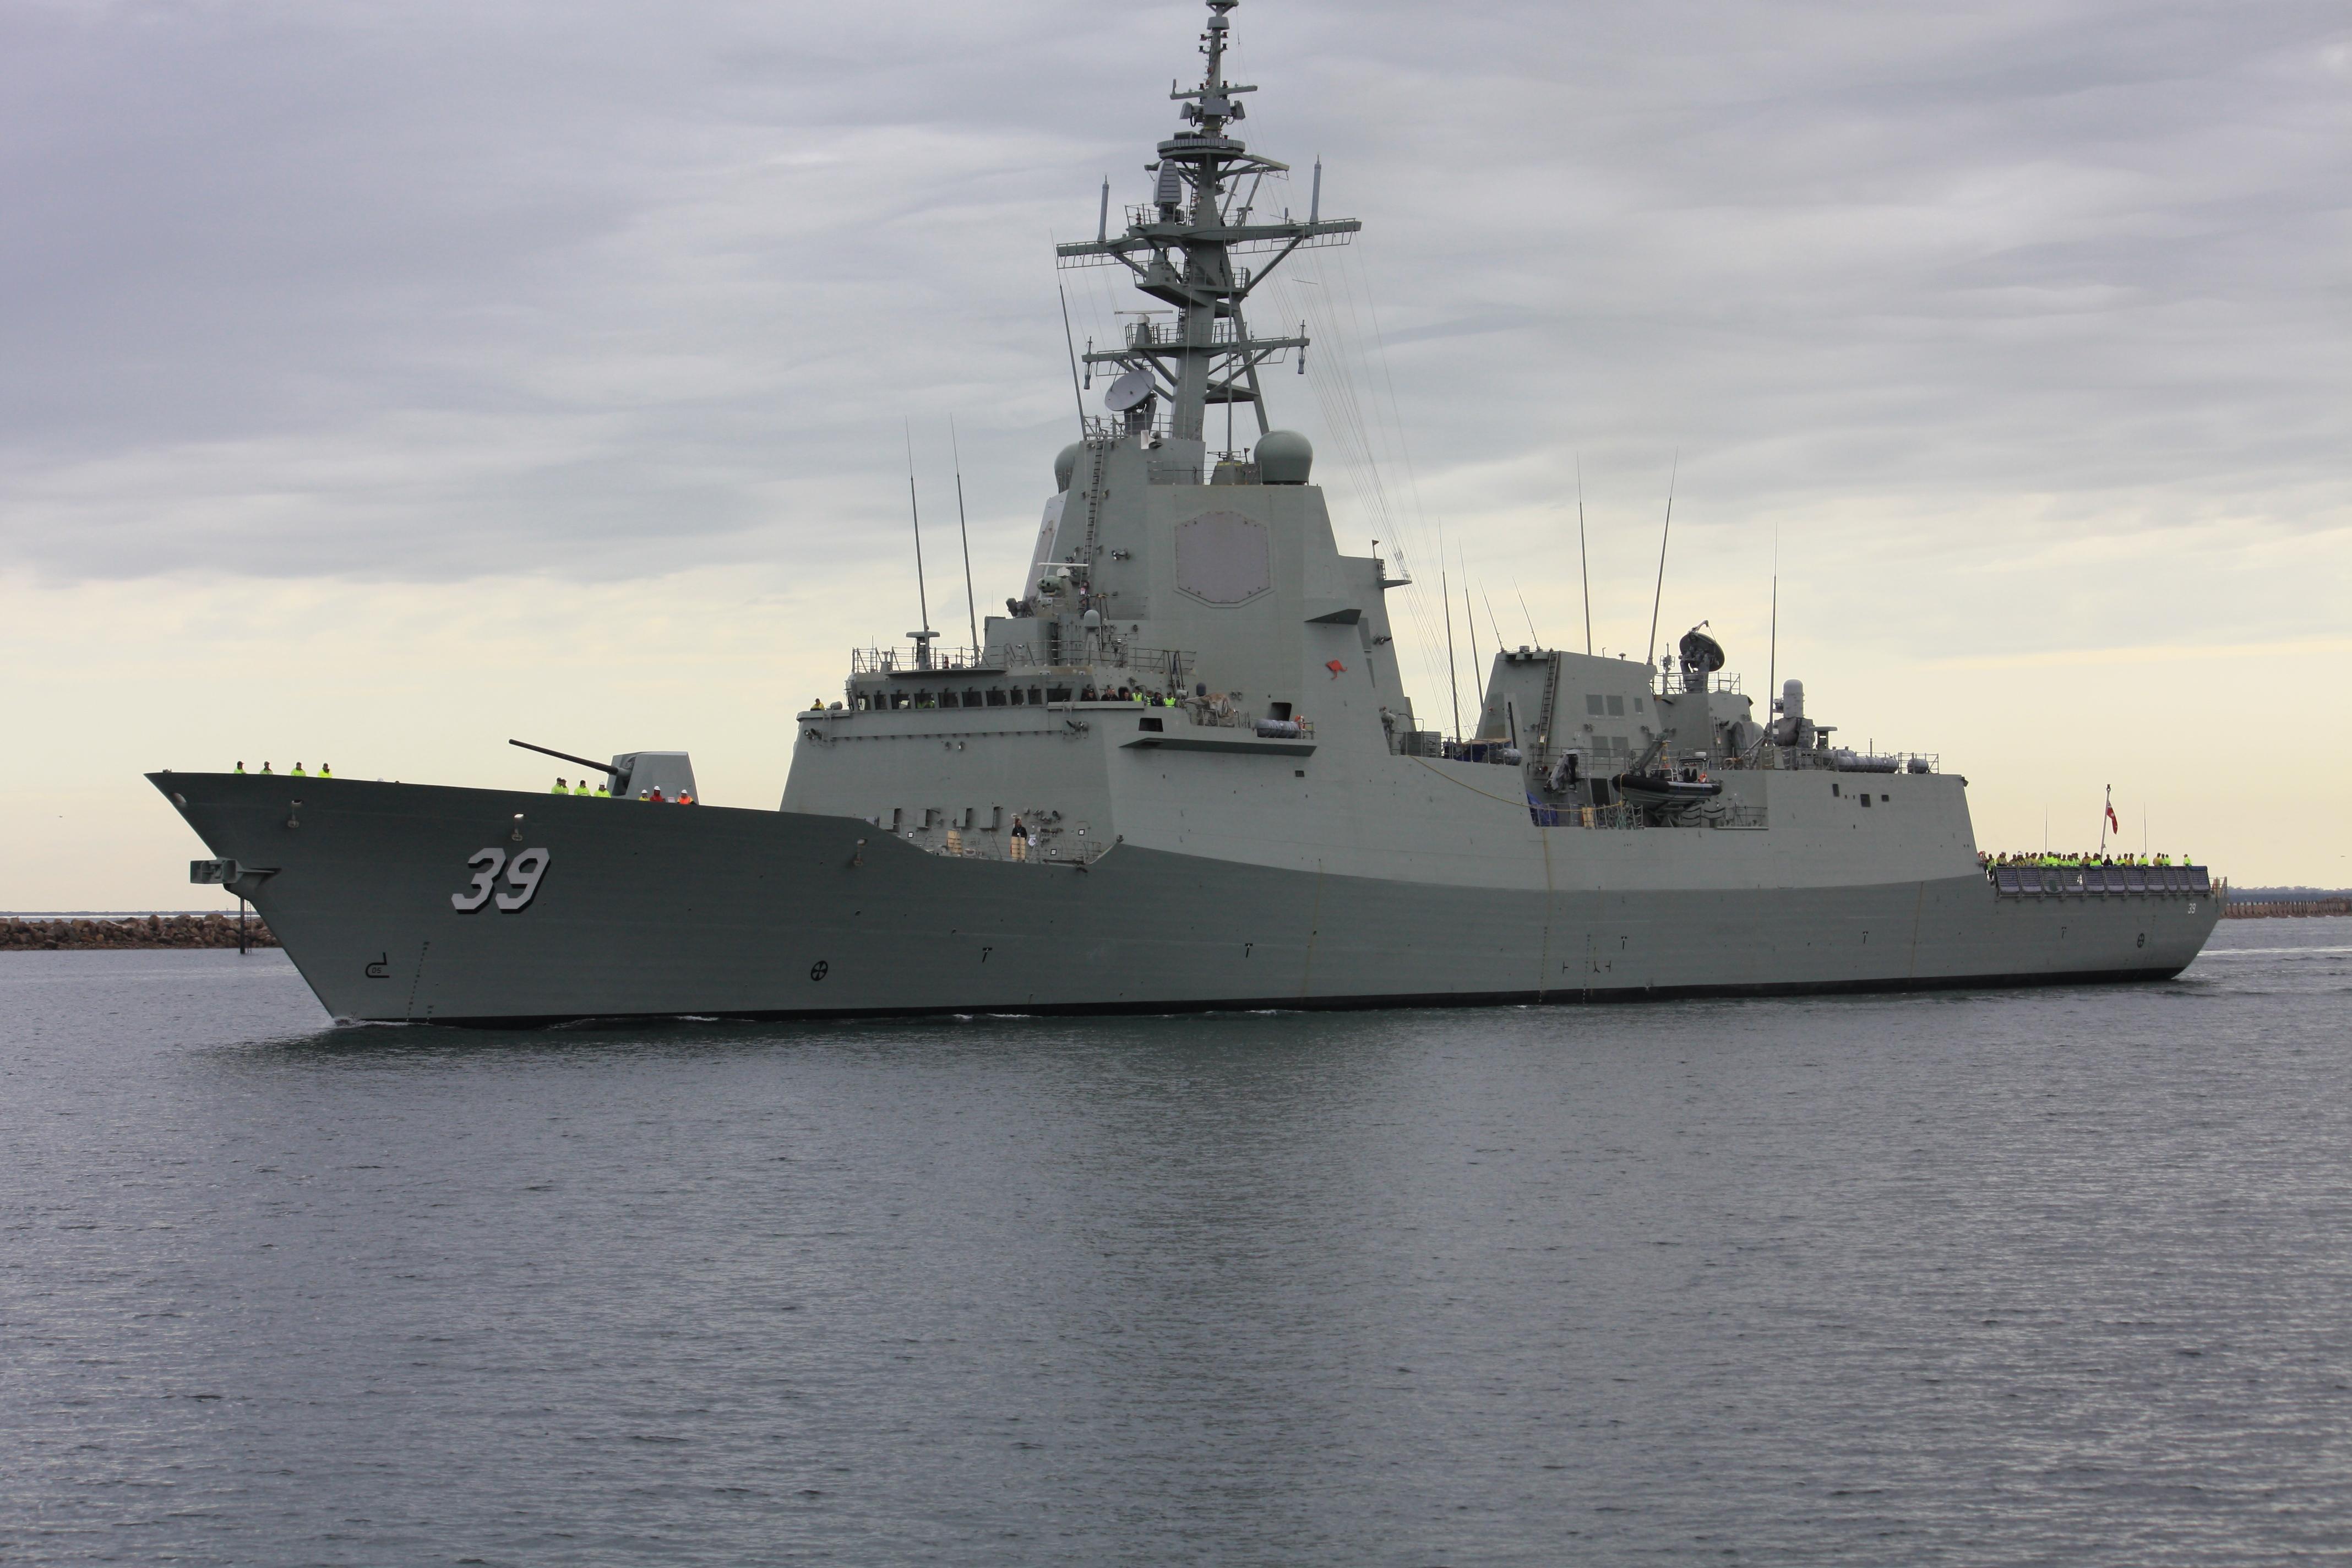 Australian Navy - Marine Australienne - Page 4 29334488680_7272bcc659_o